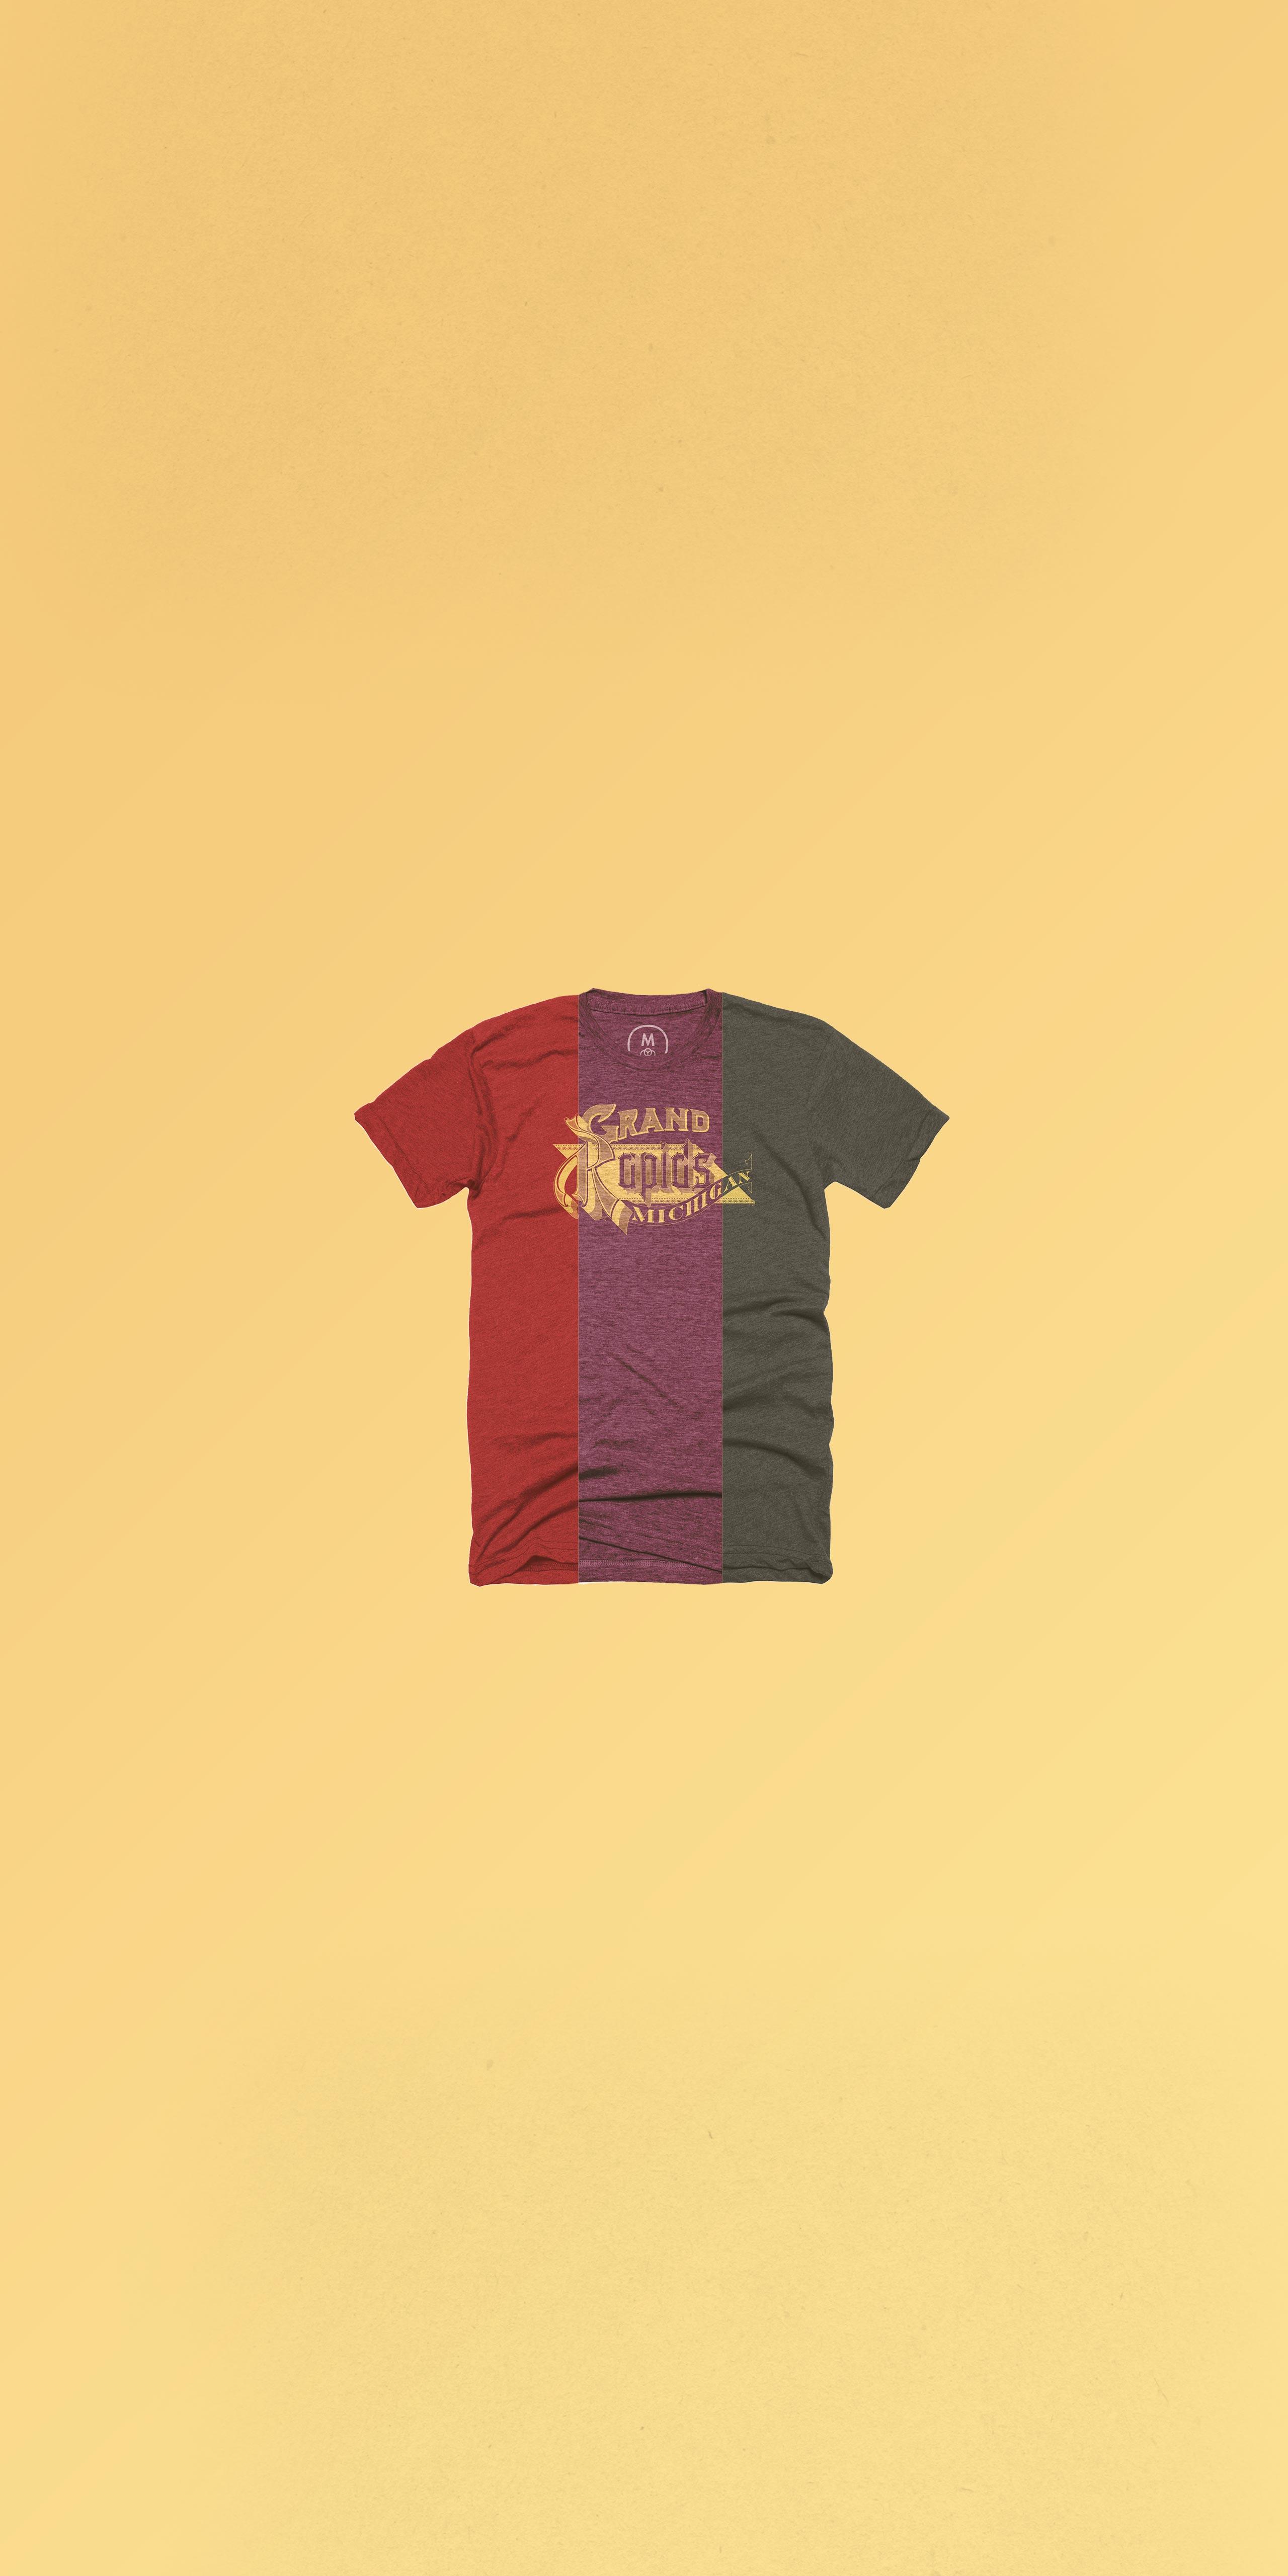 cotton bureau print in 3 colors